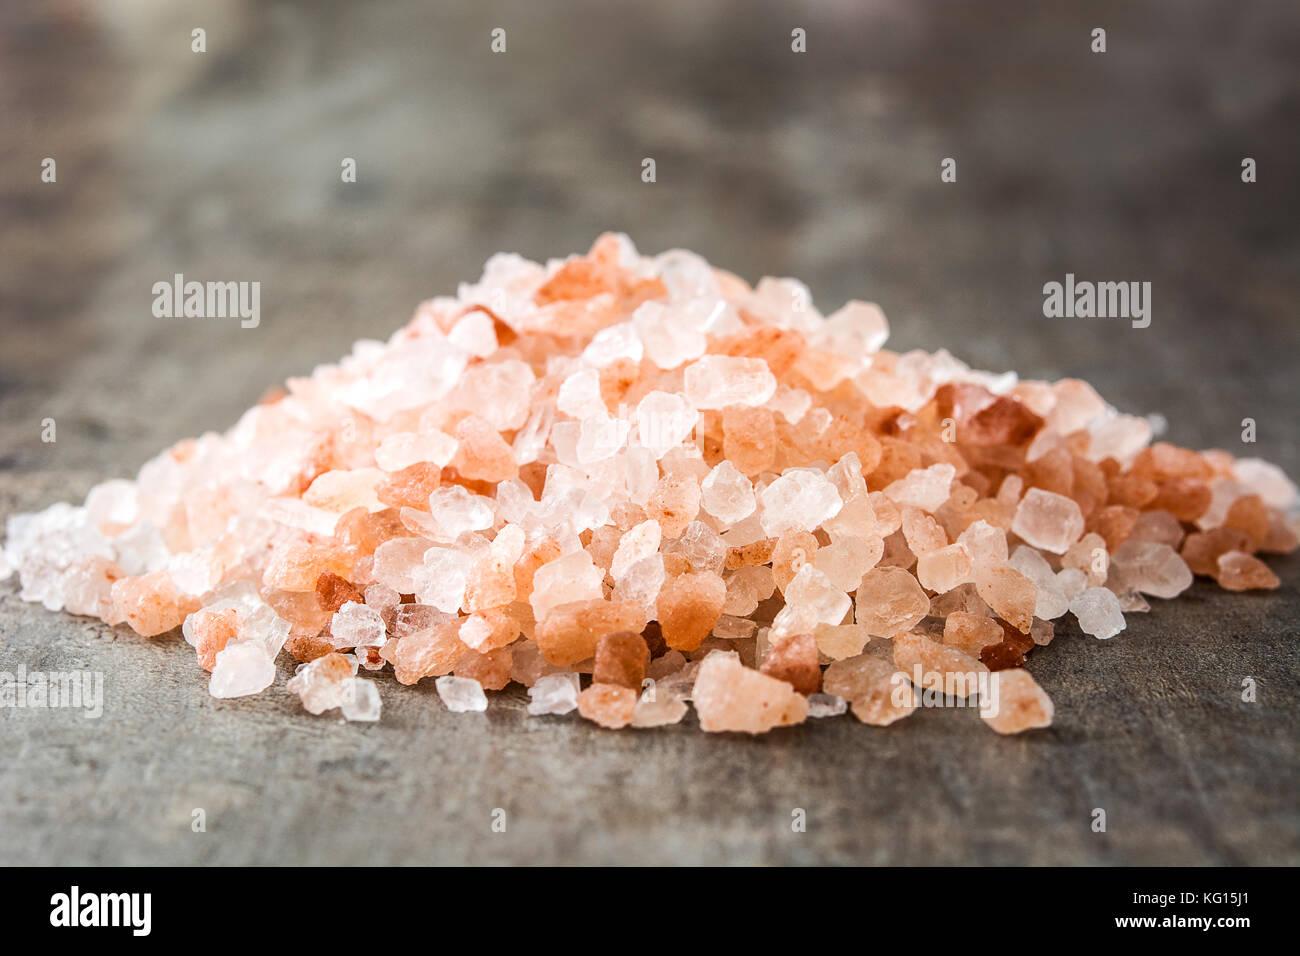 Himalayan salt on wooden table - Stock Image